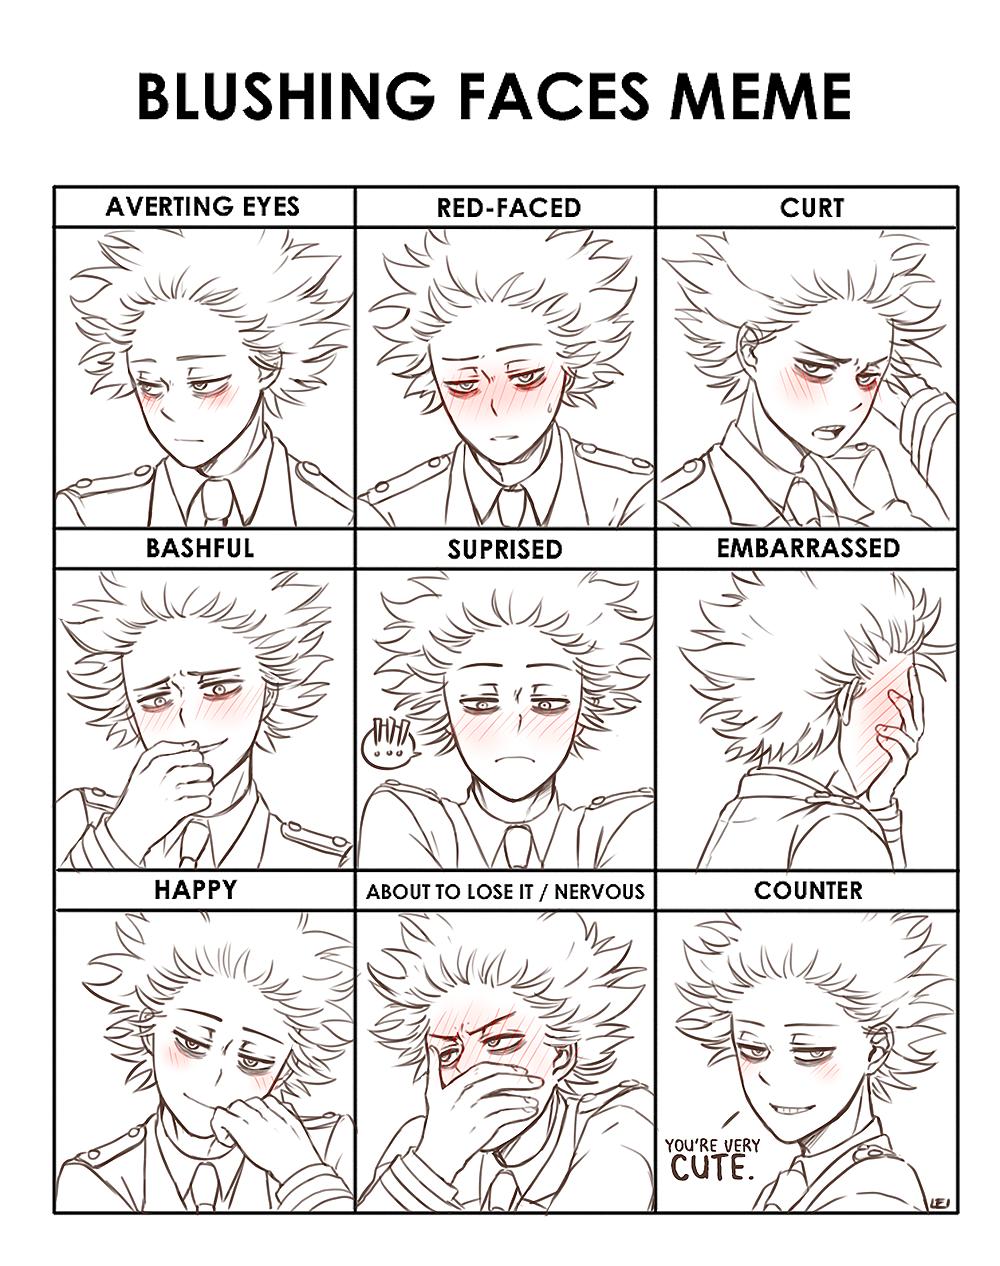 L E I L E I Hey Im Trying Out This Blushing Meme Thing And My Hero My Hero Academia Manga Blushing Face